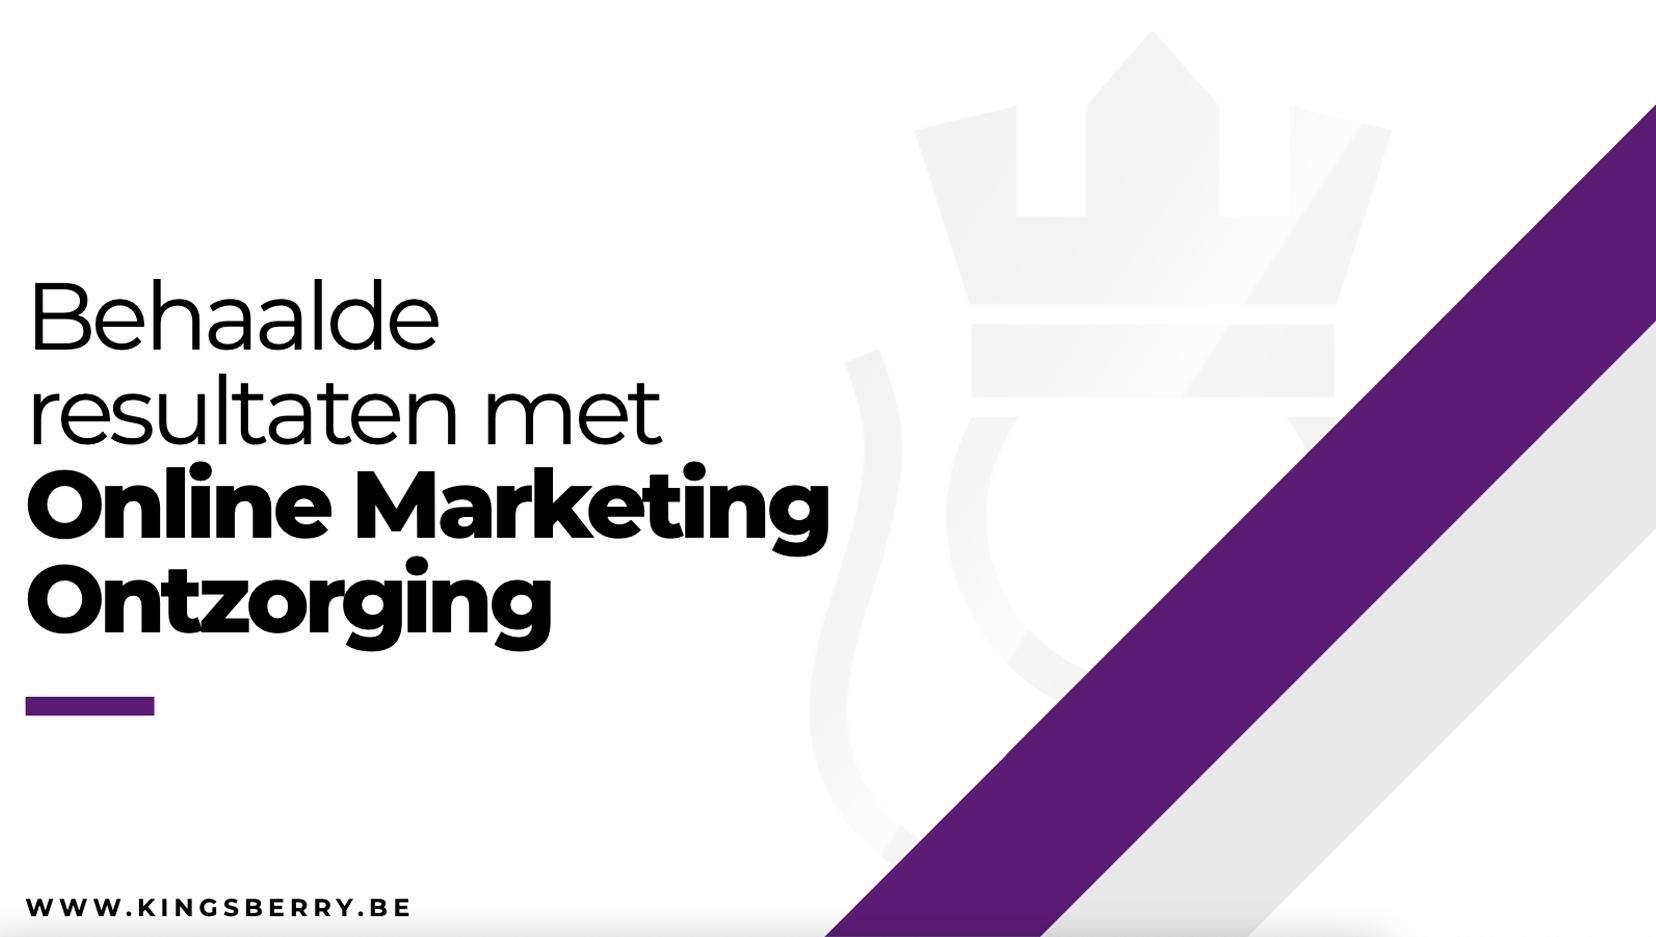 Kingsberry-online-marketing-ontzorging